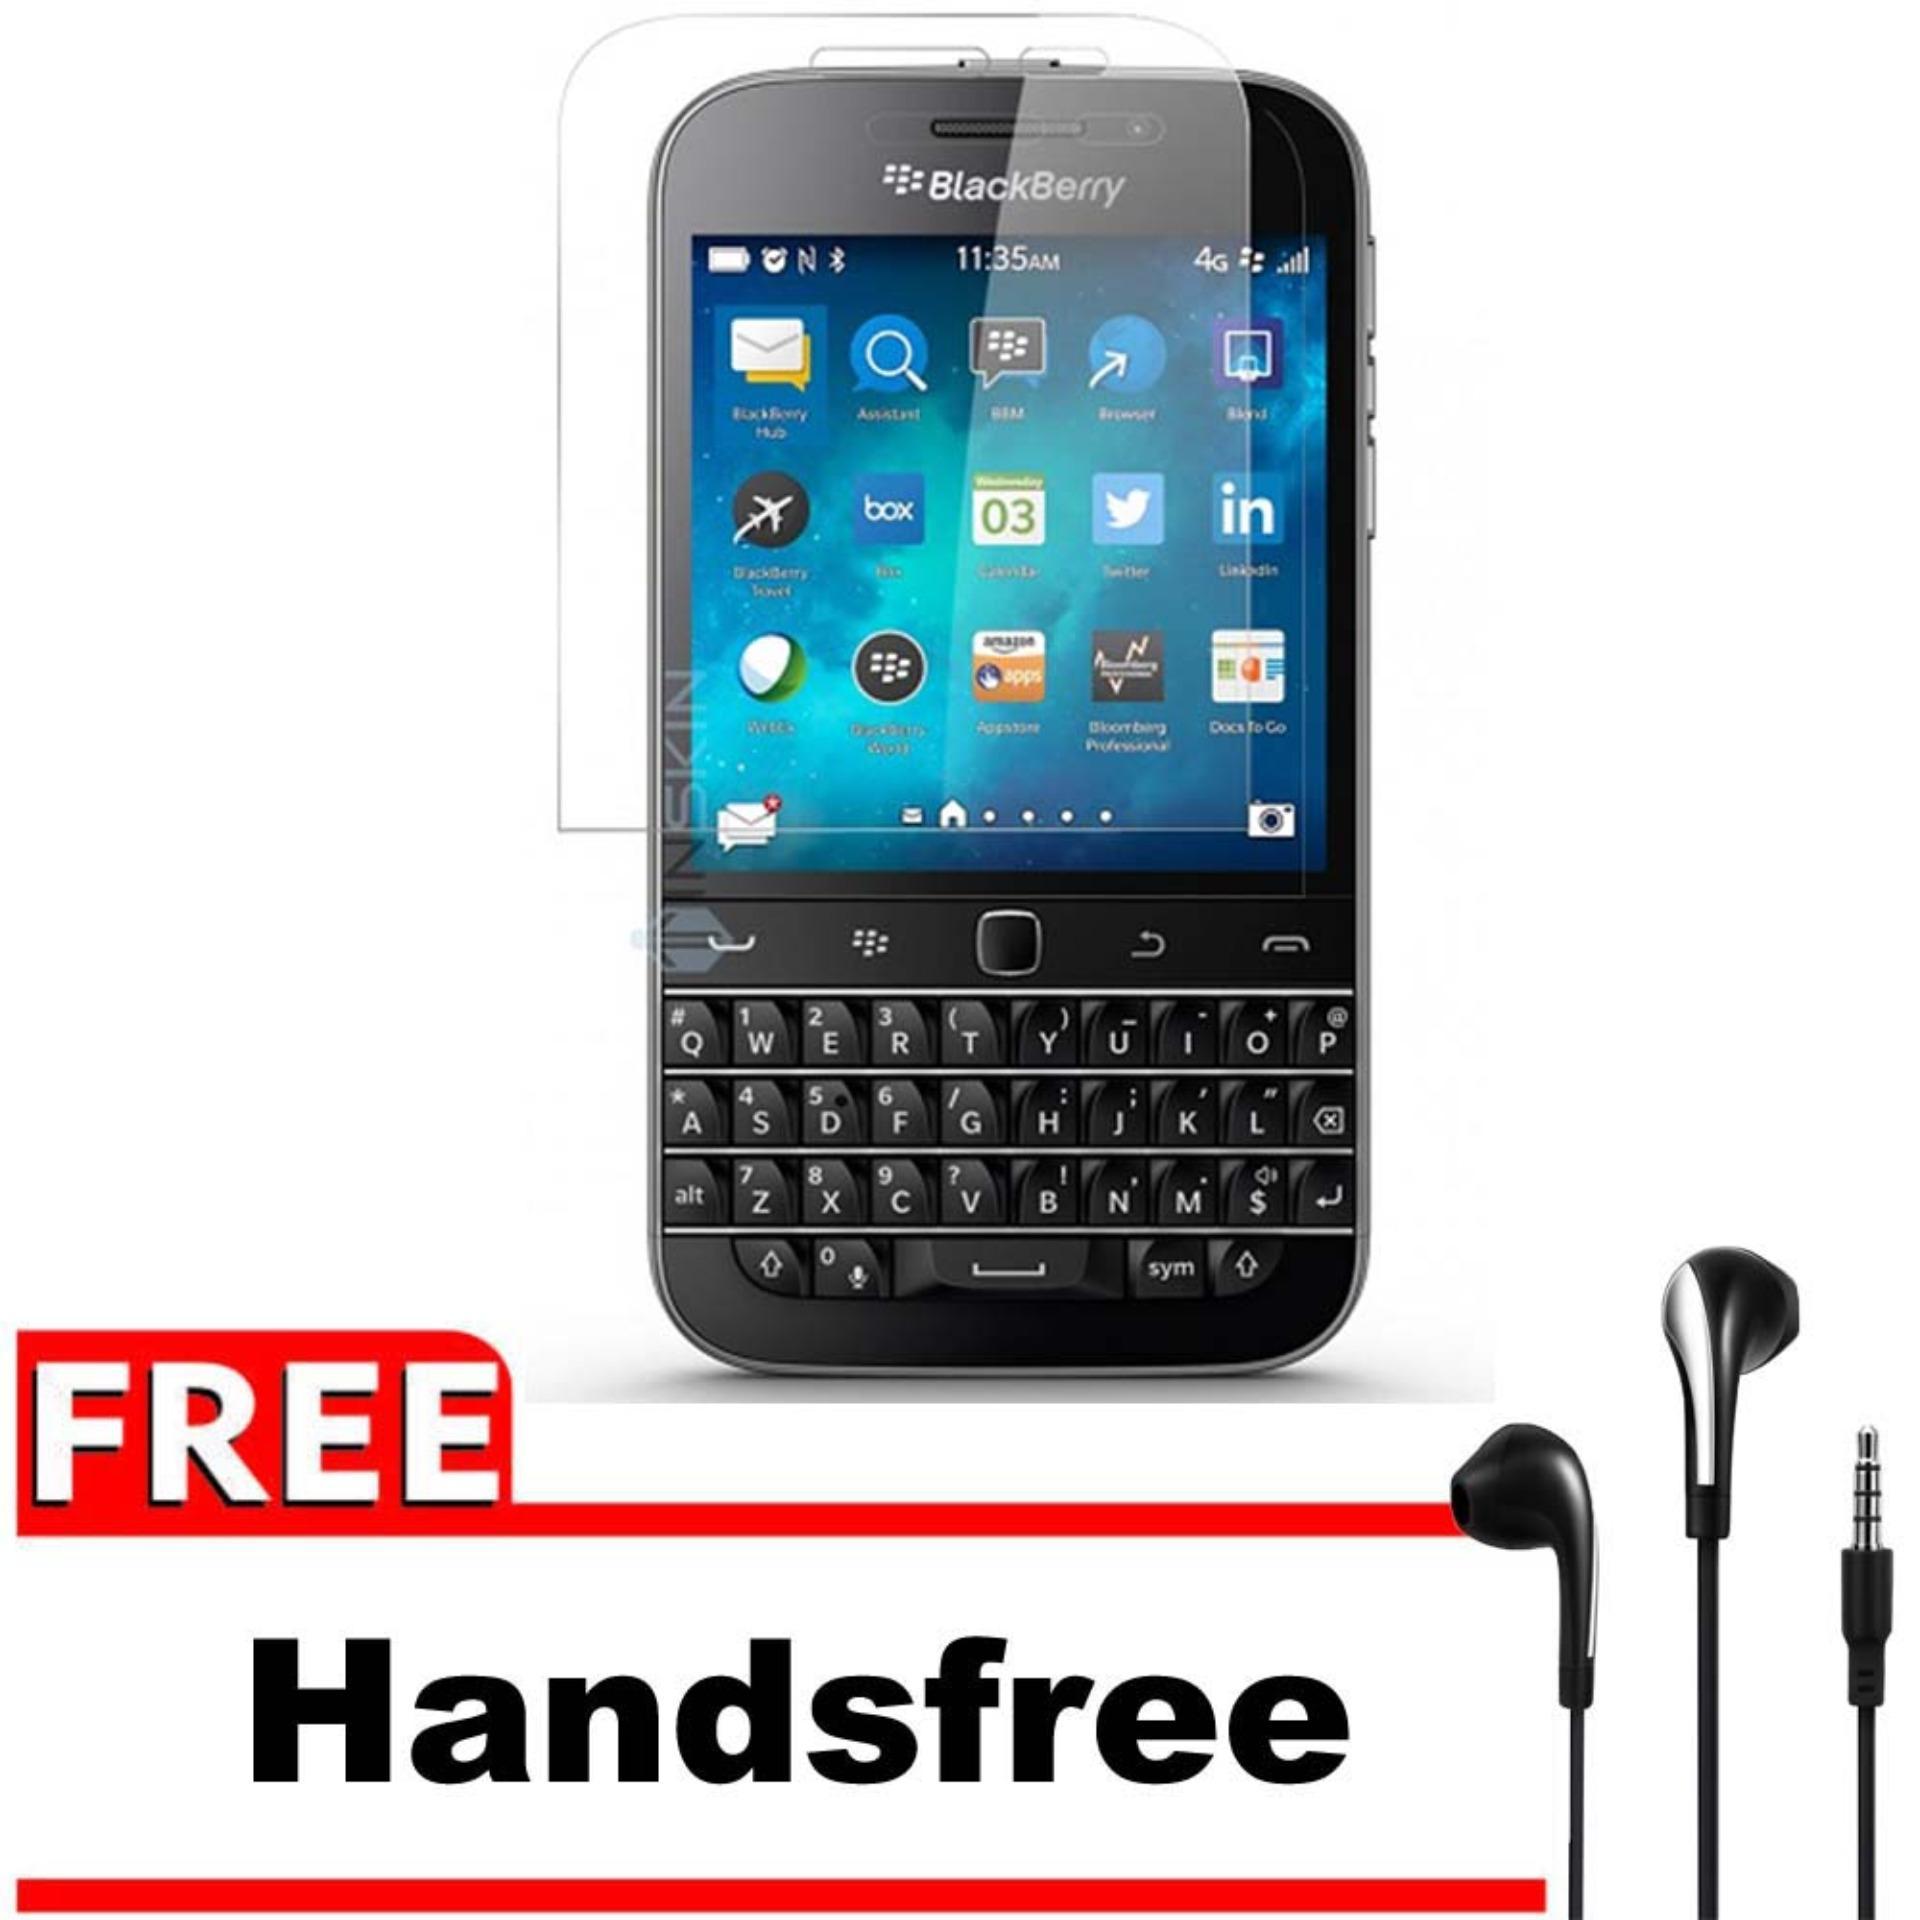 Vn Blackberry BB Q20 / Classic Tempered Glass 9H Screen Protector 0.32mm + Gratis Free Handsfree Earphone Headset Universal - Bening Transparan